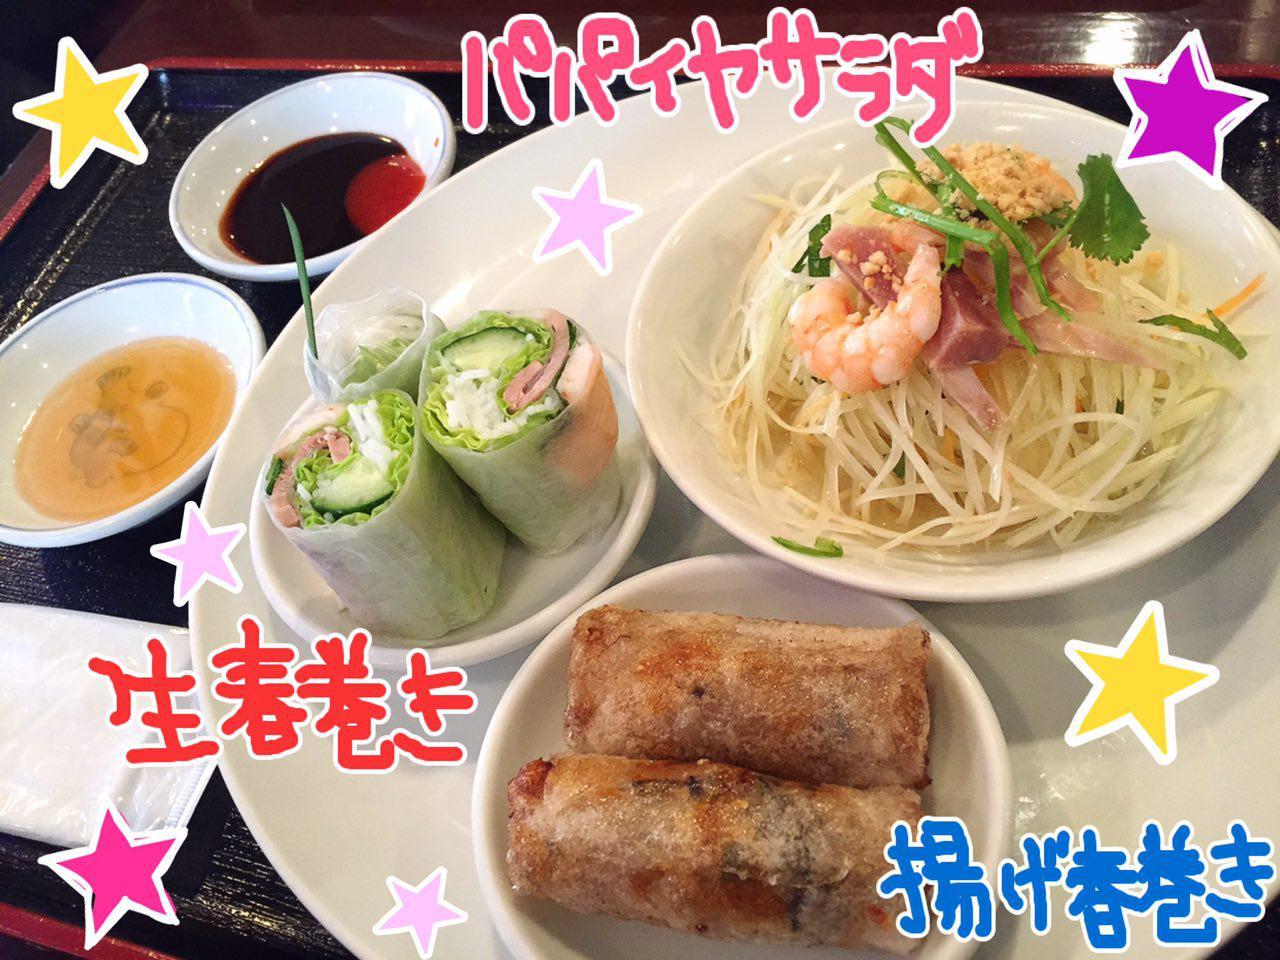 photo_2017-01-30_00-11-17.jpg